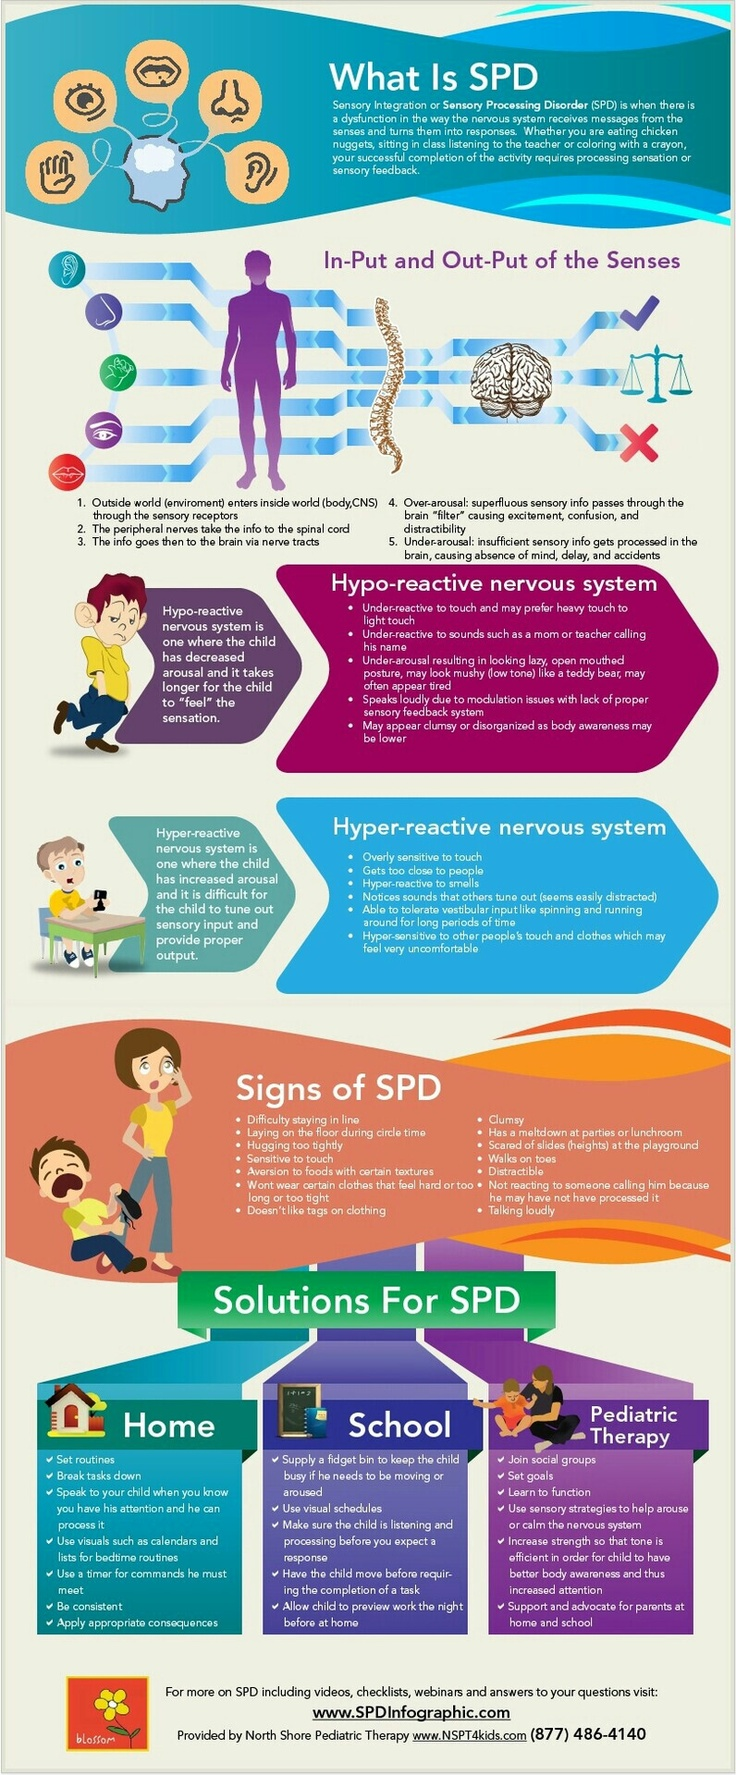 SPD....very interesting